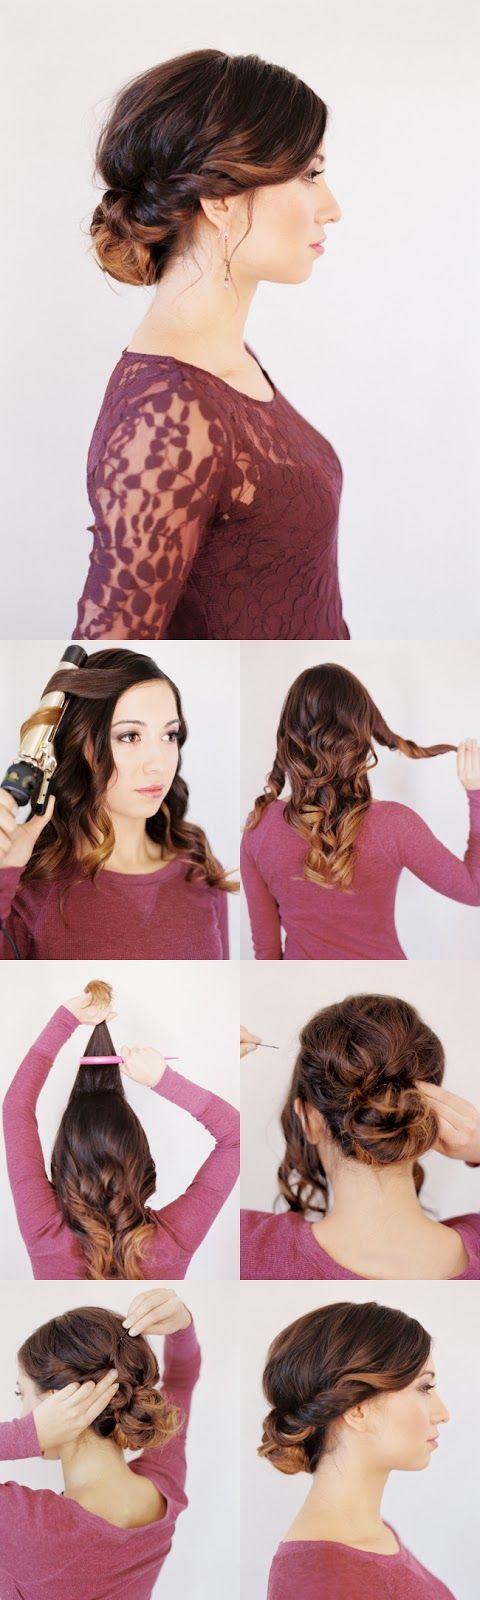 amanda paige: Loose Updo Hair Tutorial